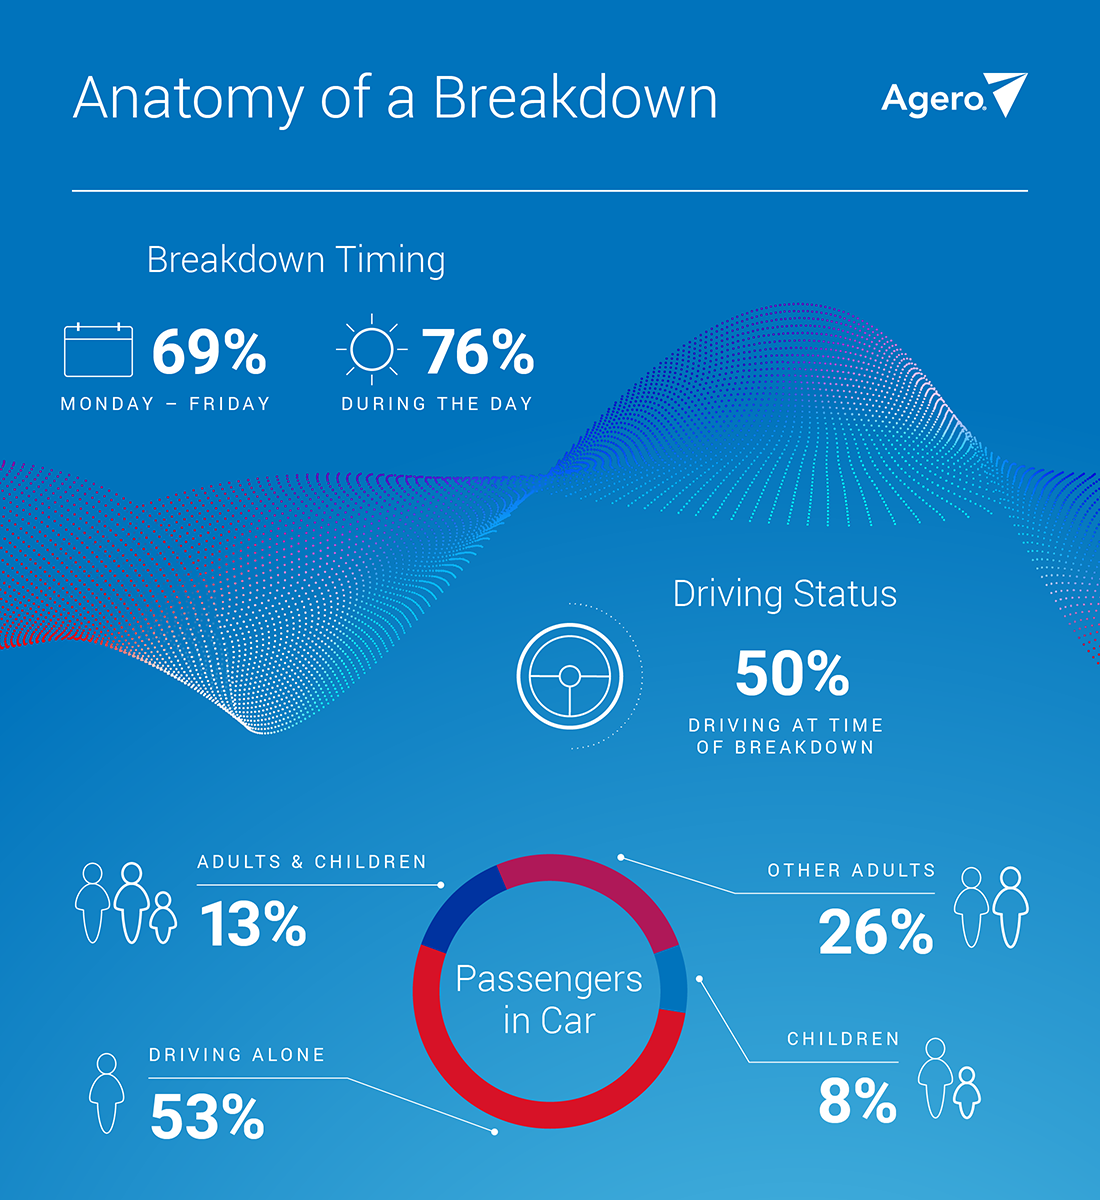 blog-image-anatomy-of-breakdown-infographic-jan2020-01